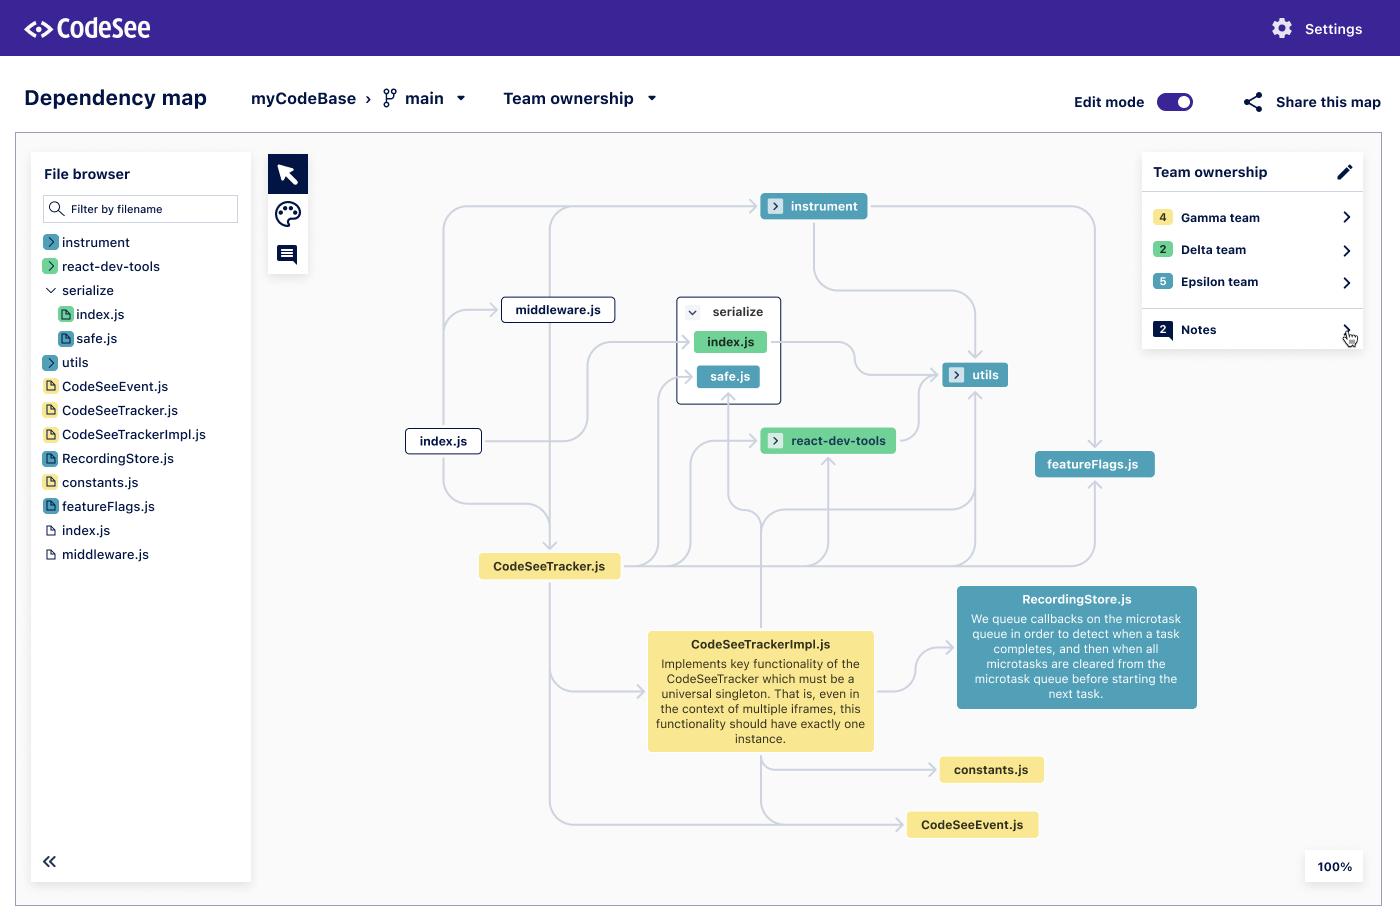 Screenshot of CodeSee Maps